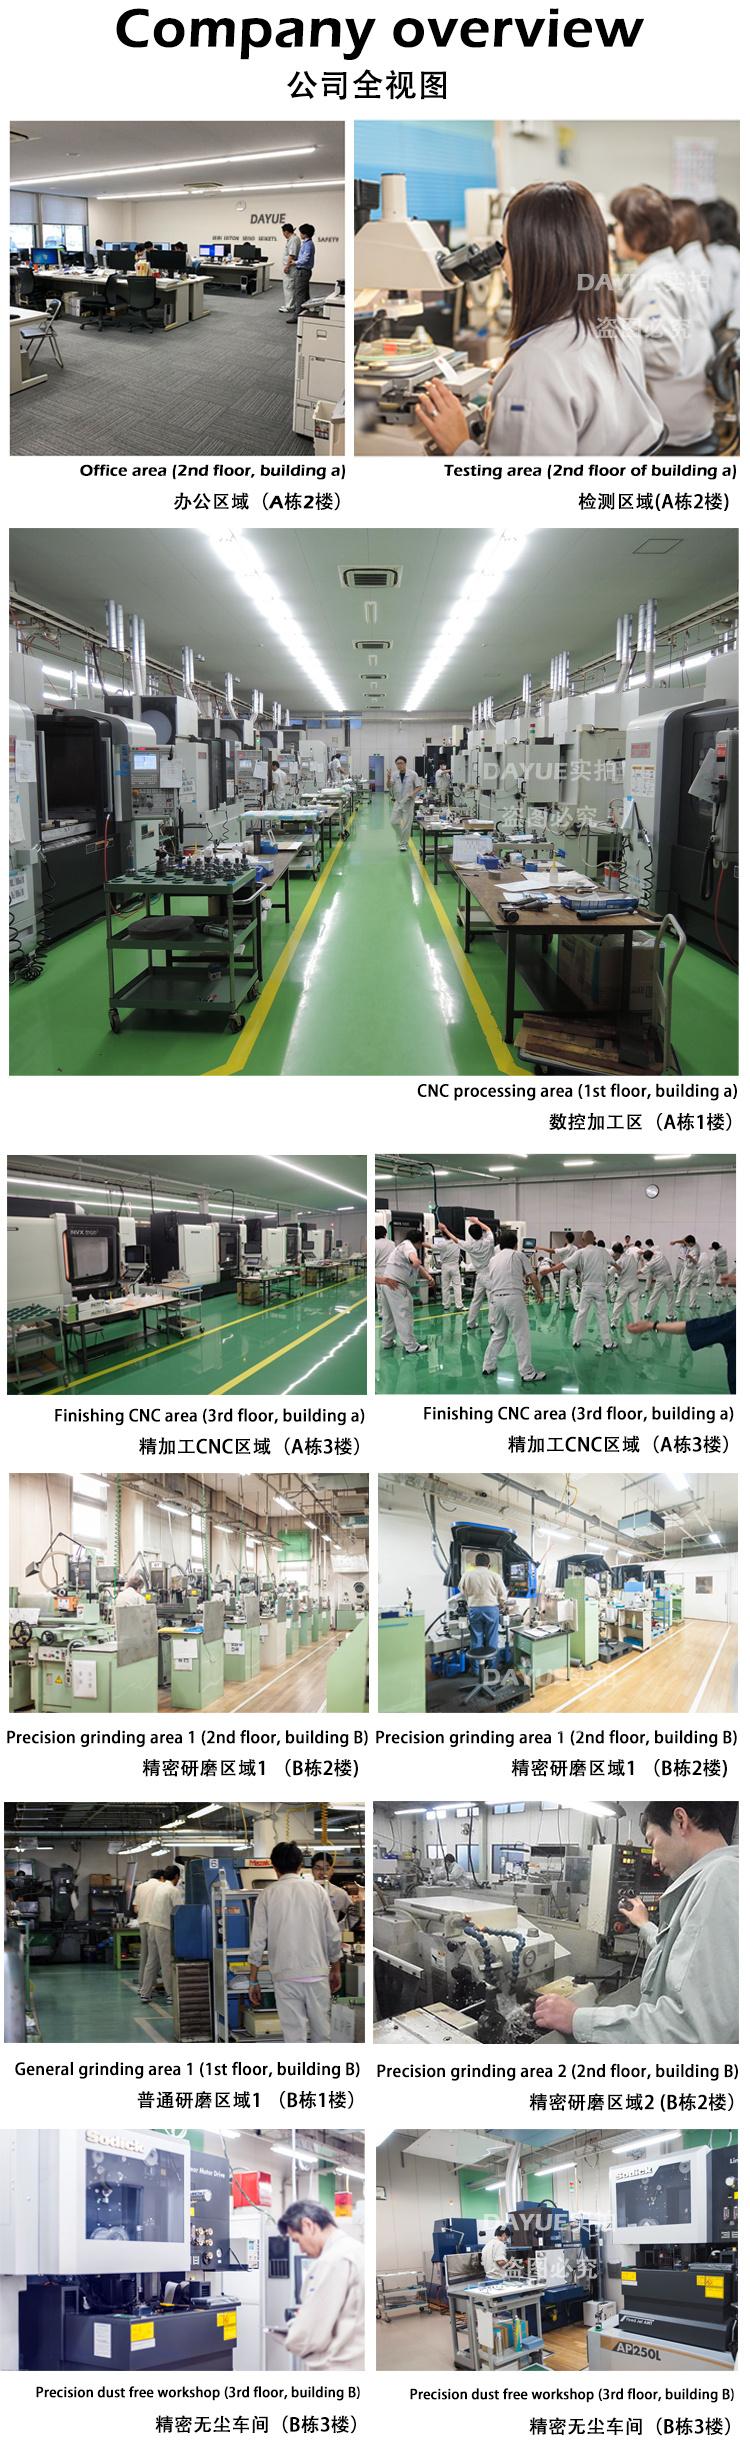 Dayue Precision Technology (Dongguan) Co., Ltd.